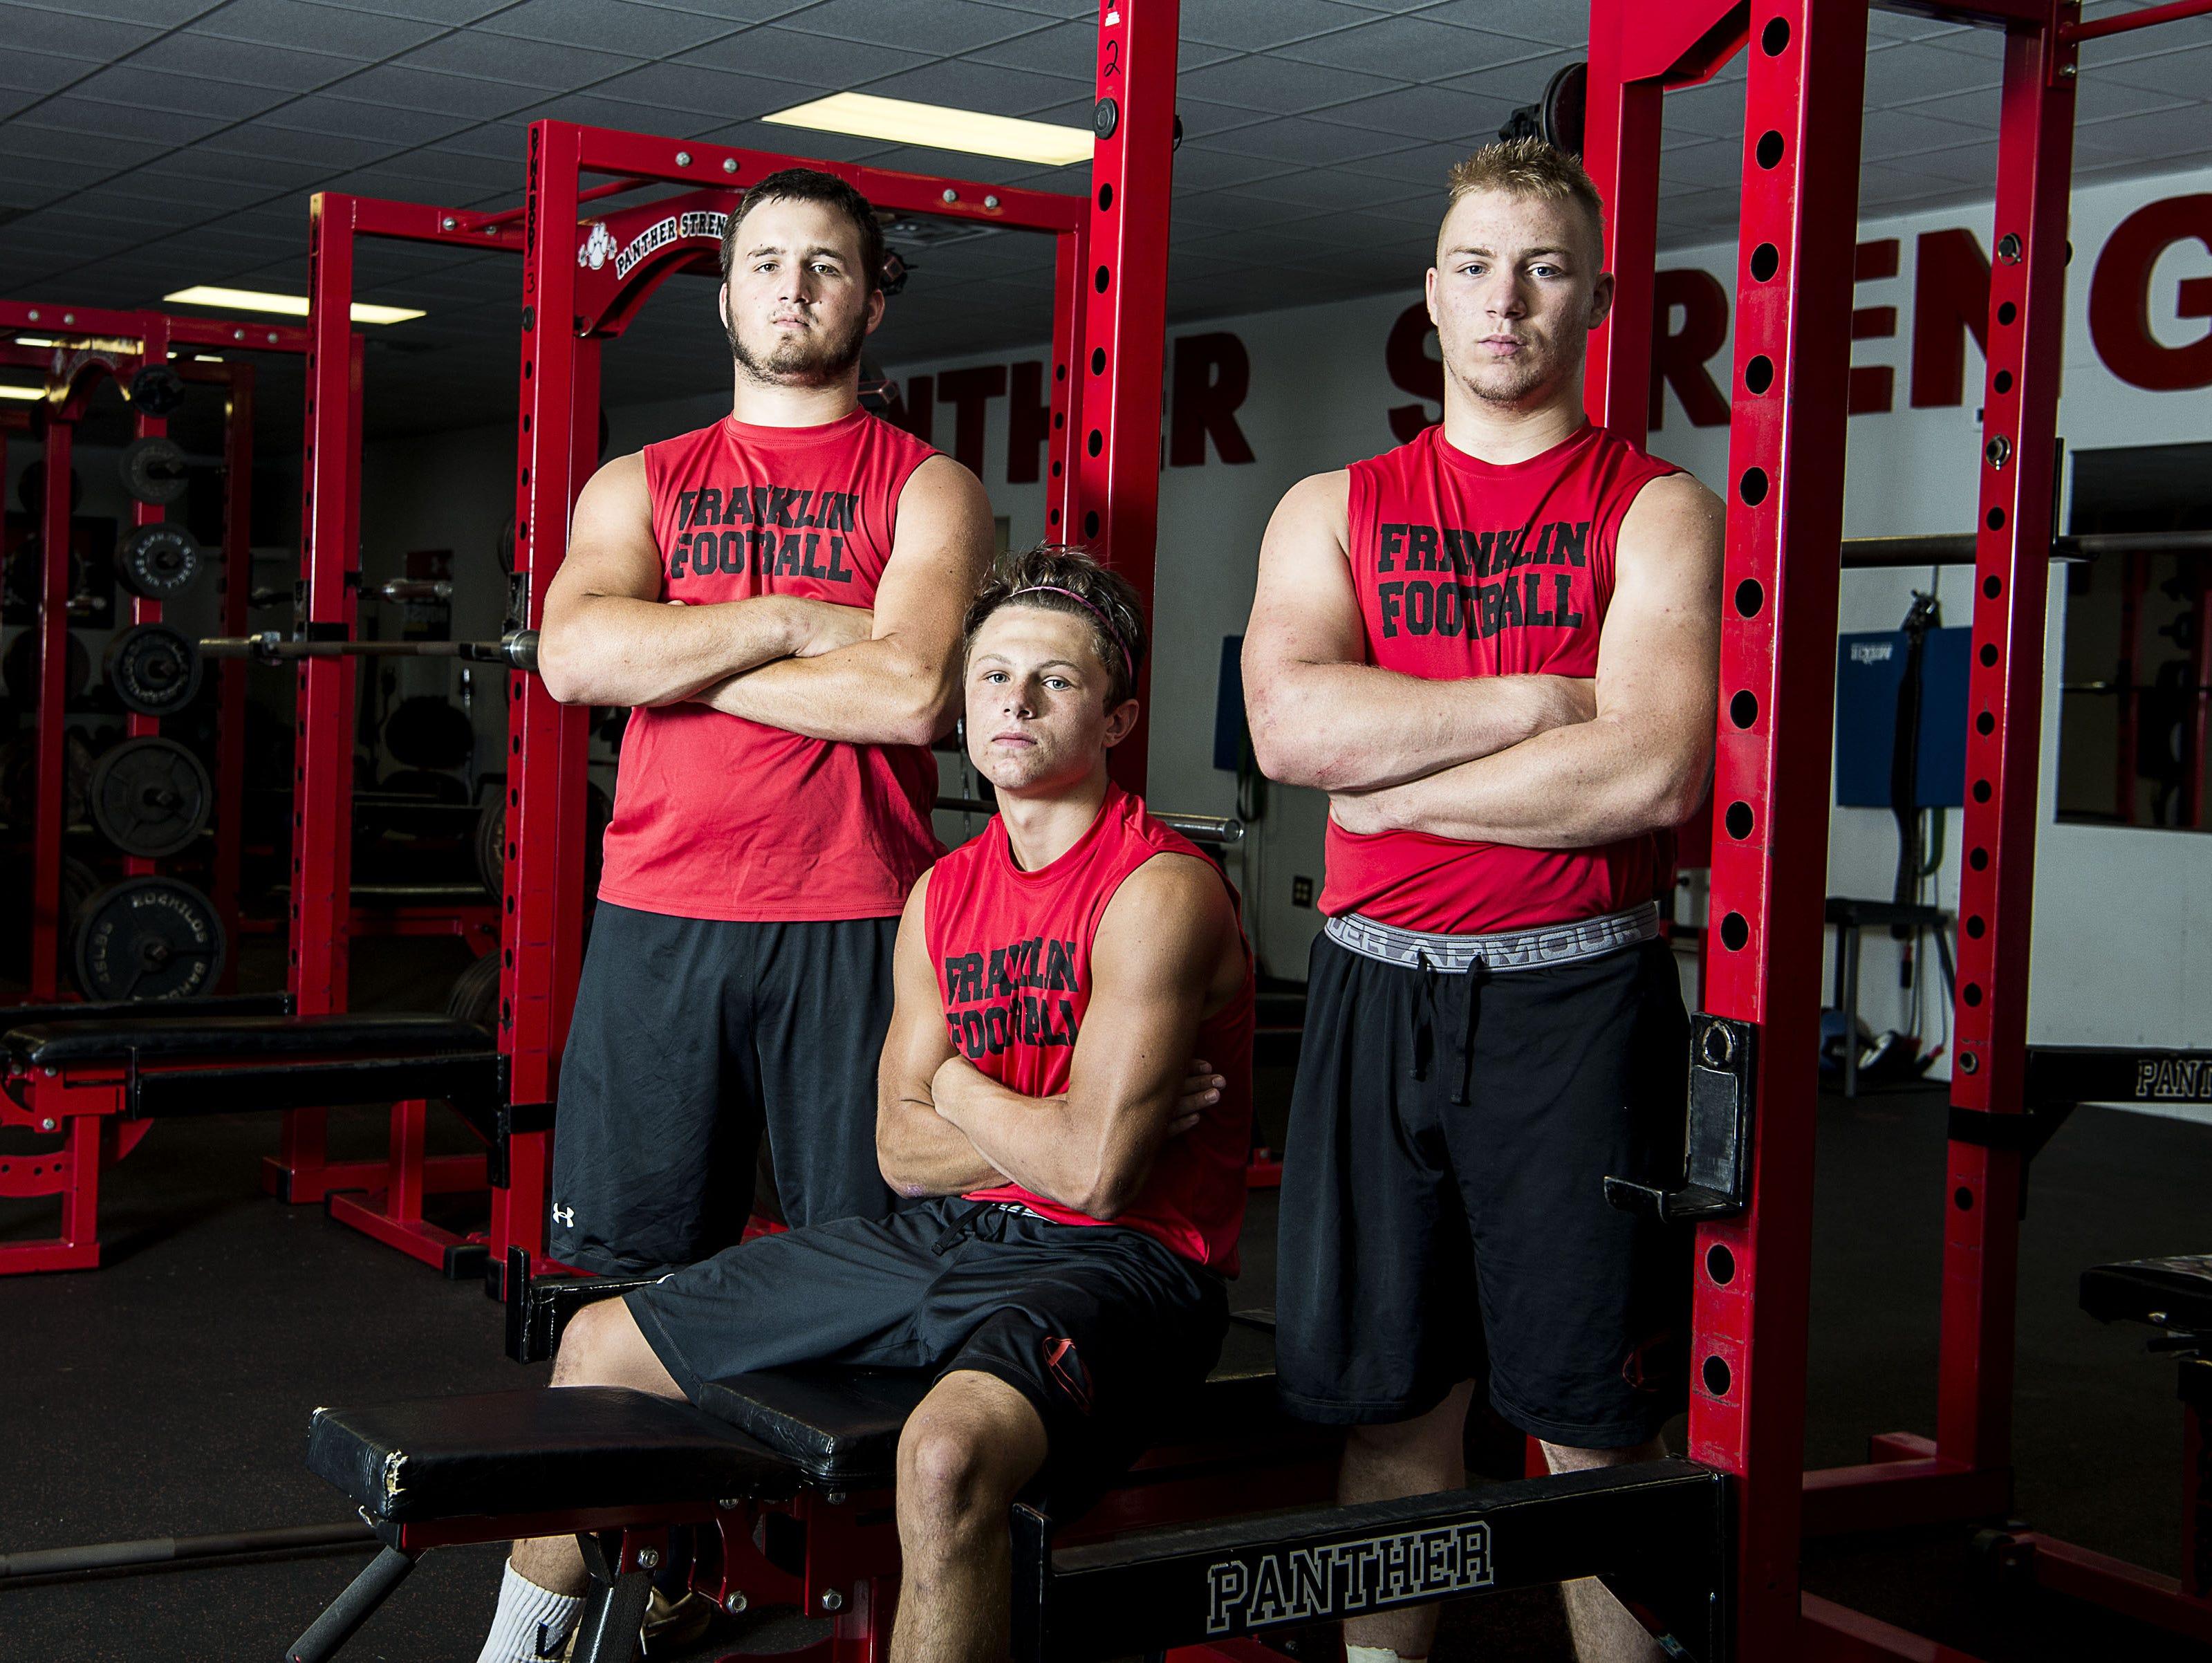 Franklin football players Dillon Daves, Logan Tallent and Jordan Nugent.